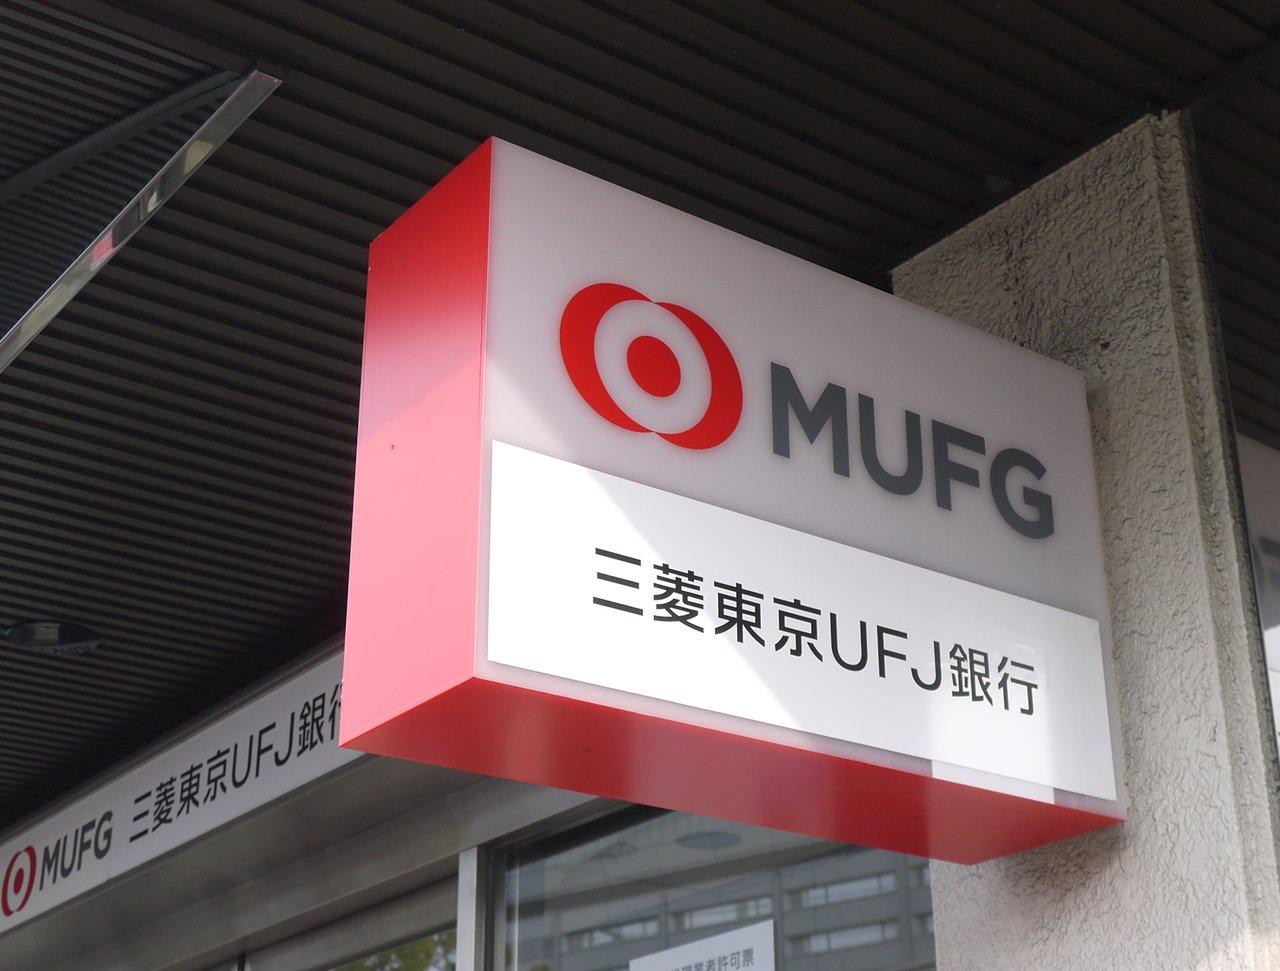 Ufj 銀行 東京 三菱